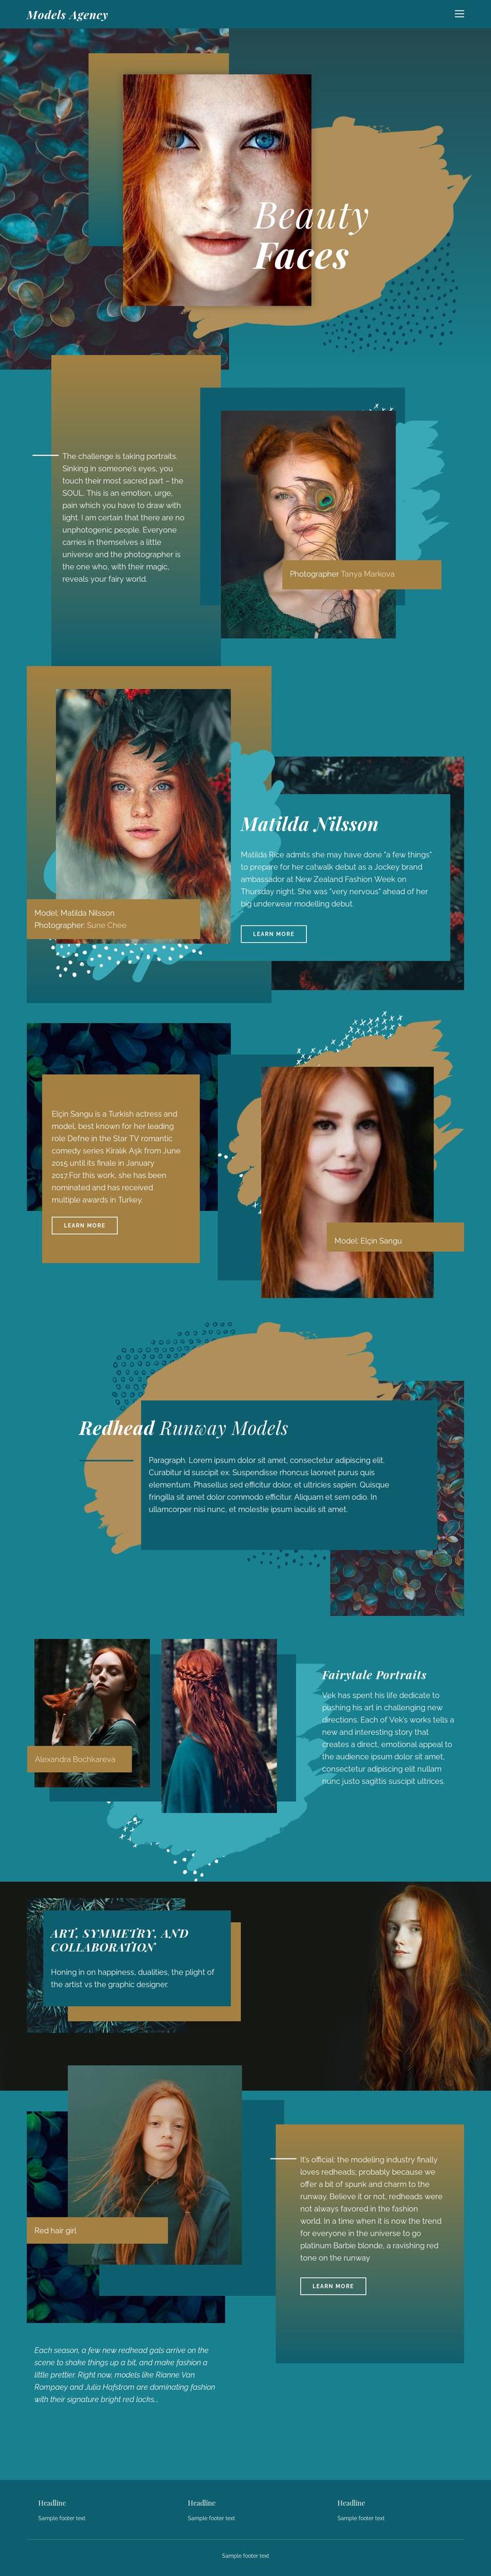 Faces of modern fashion Web Page Designer